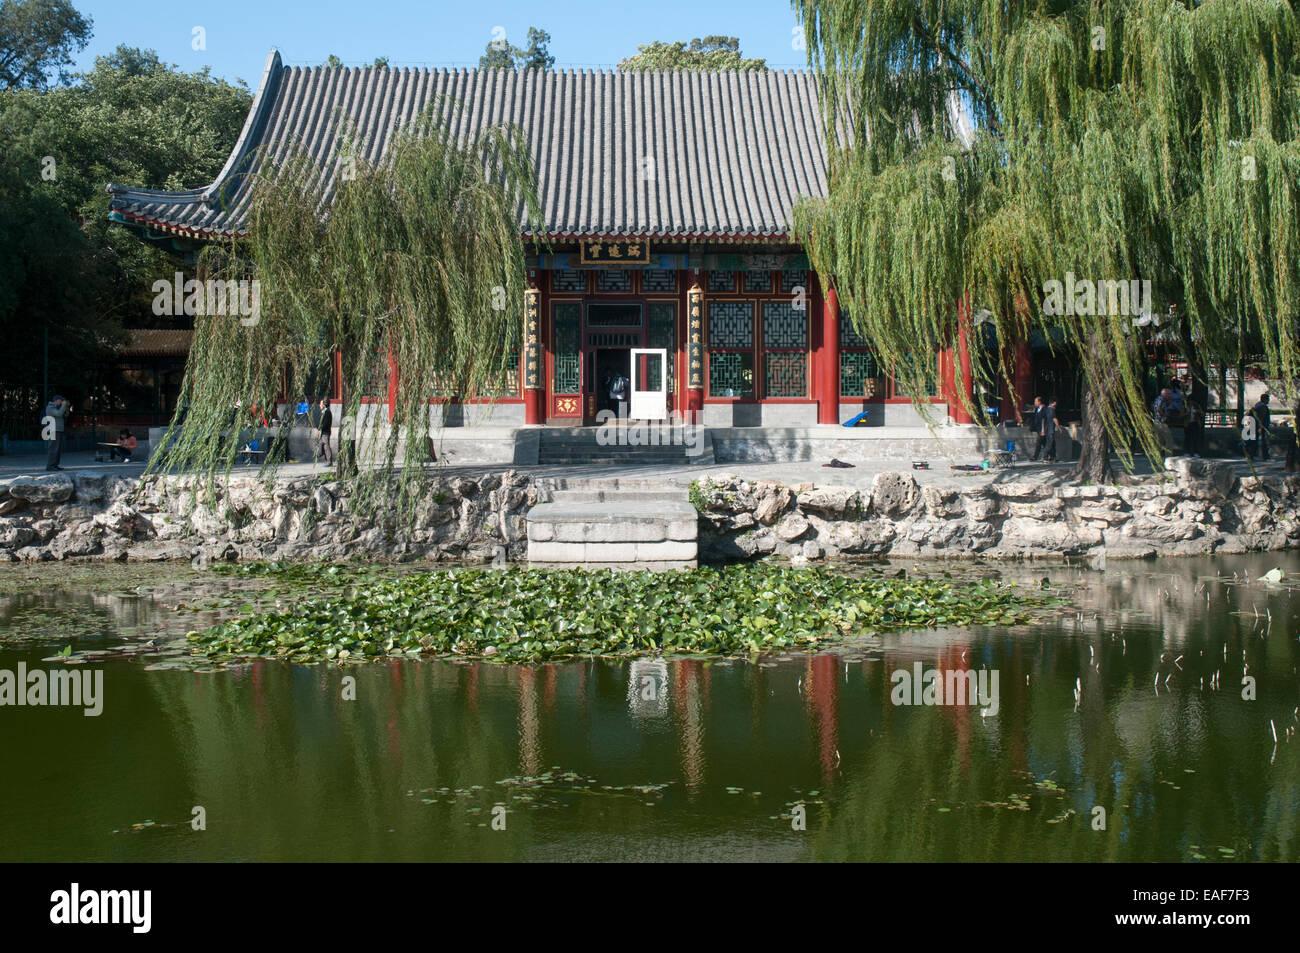 Garden of Harmonious Pleasures (Xieju Yuan), Summer Palace, Beijing - Stock Image